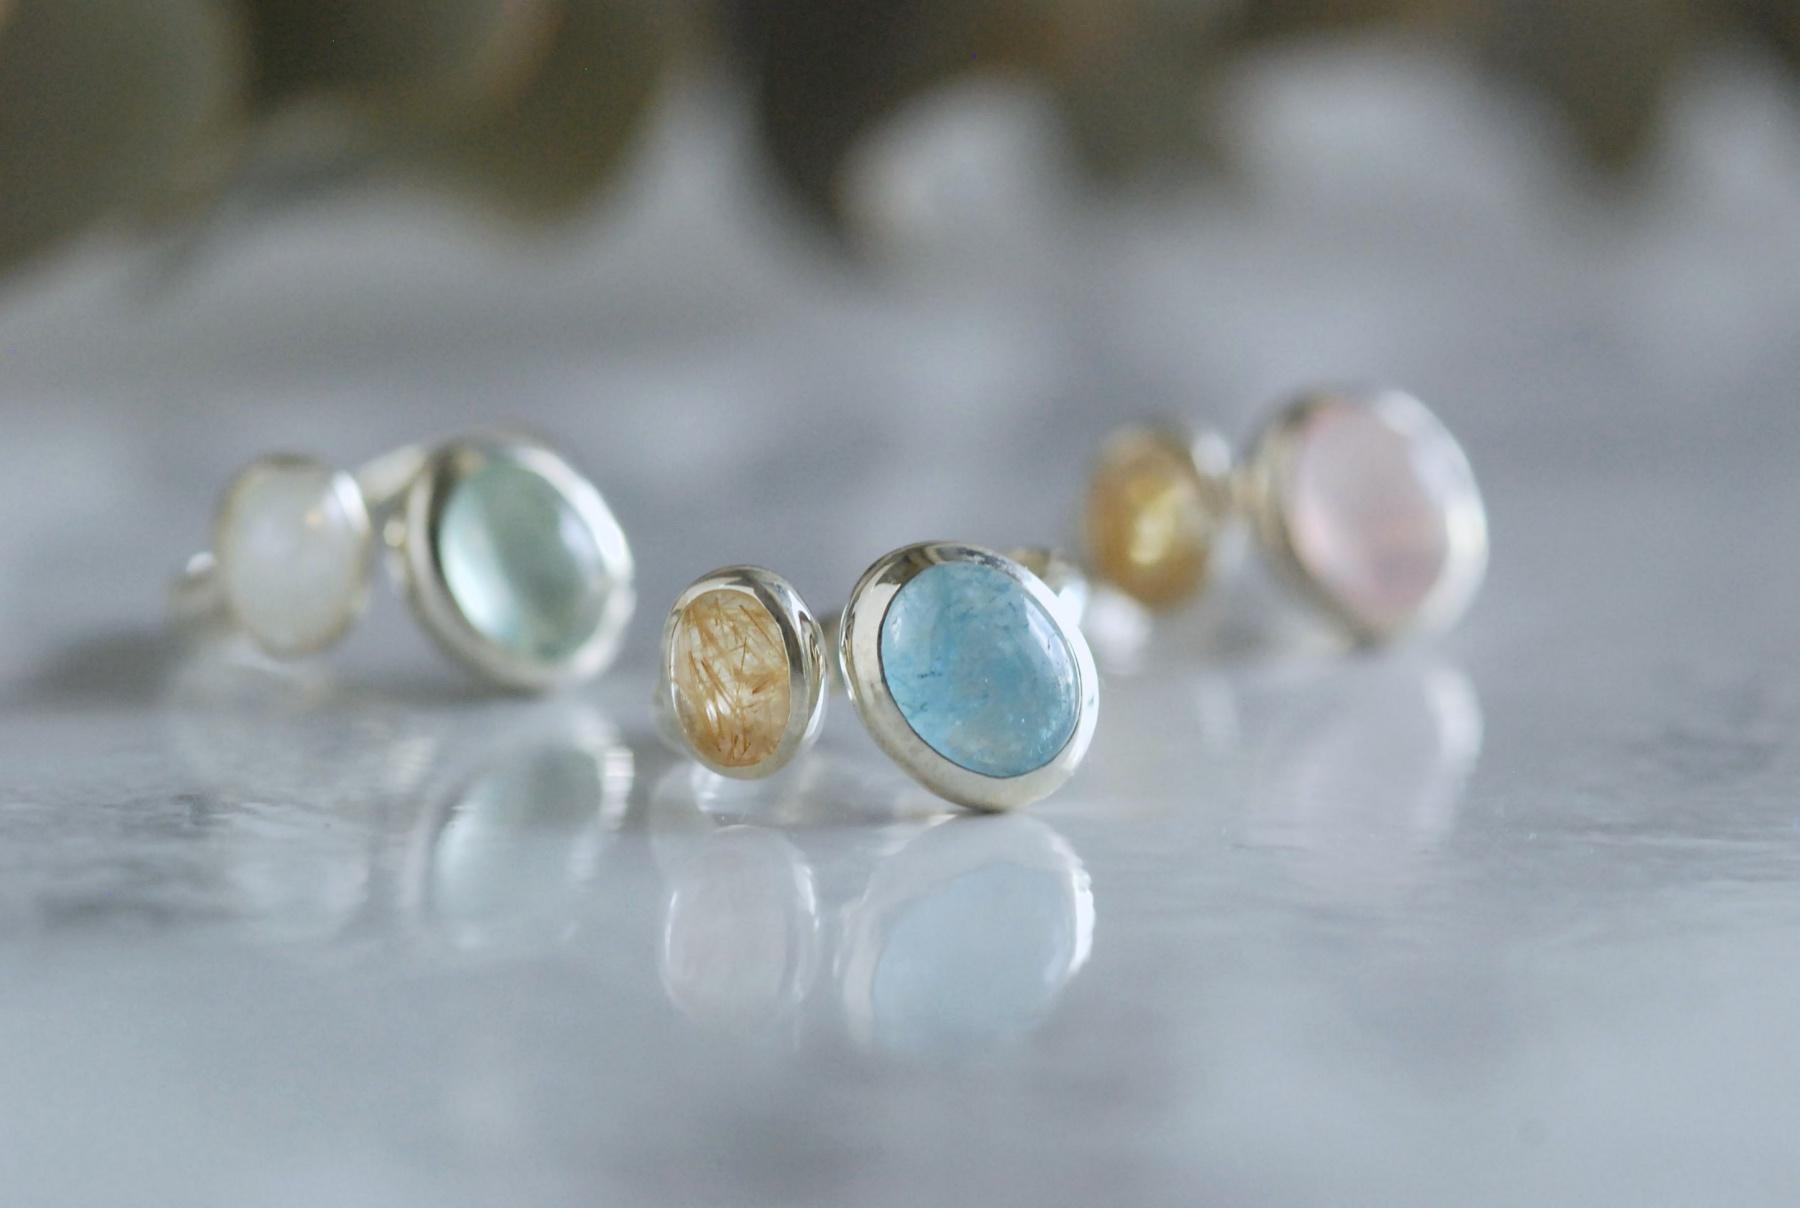 DoubleMoon jewelry